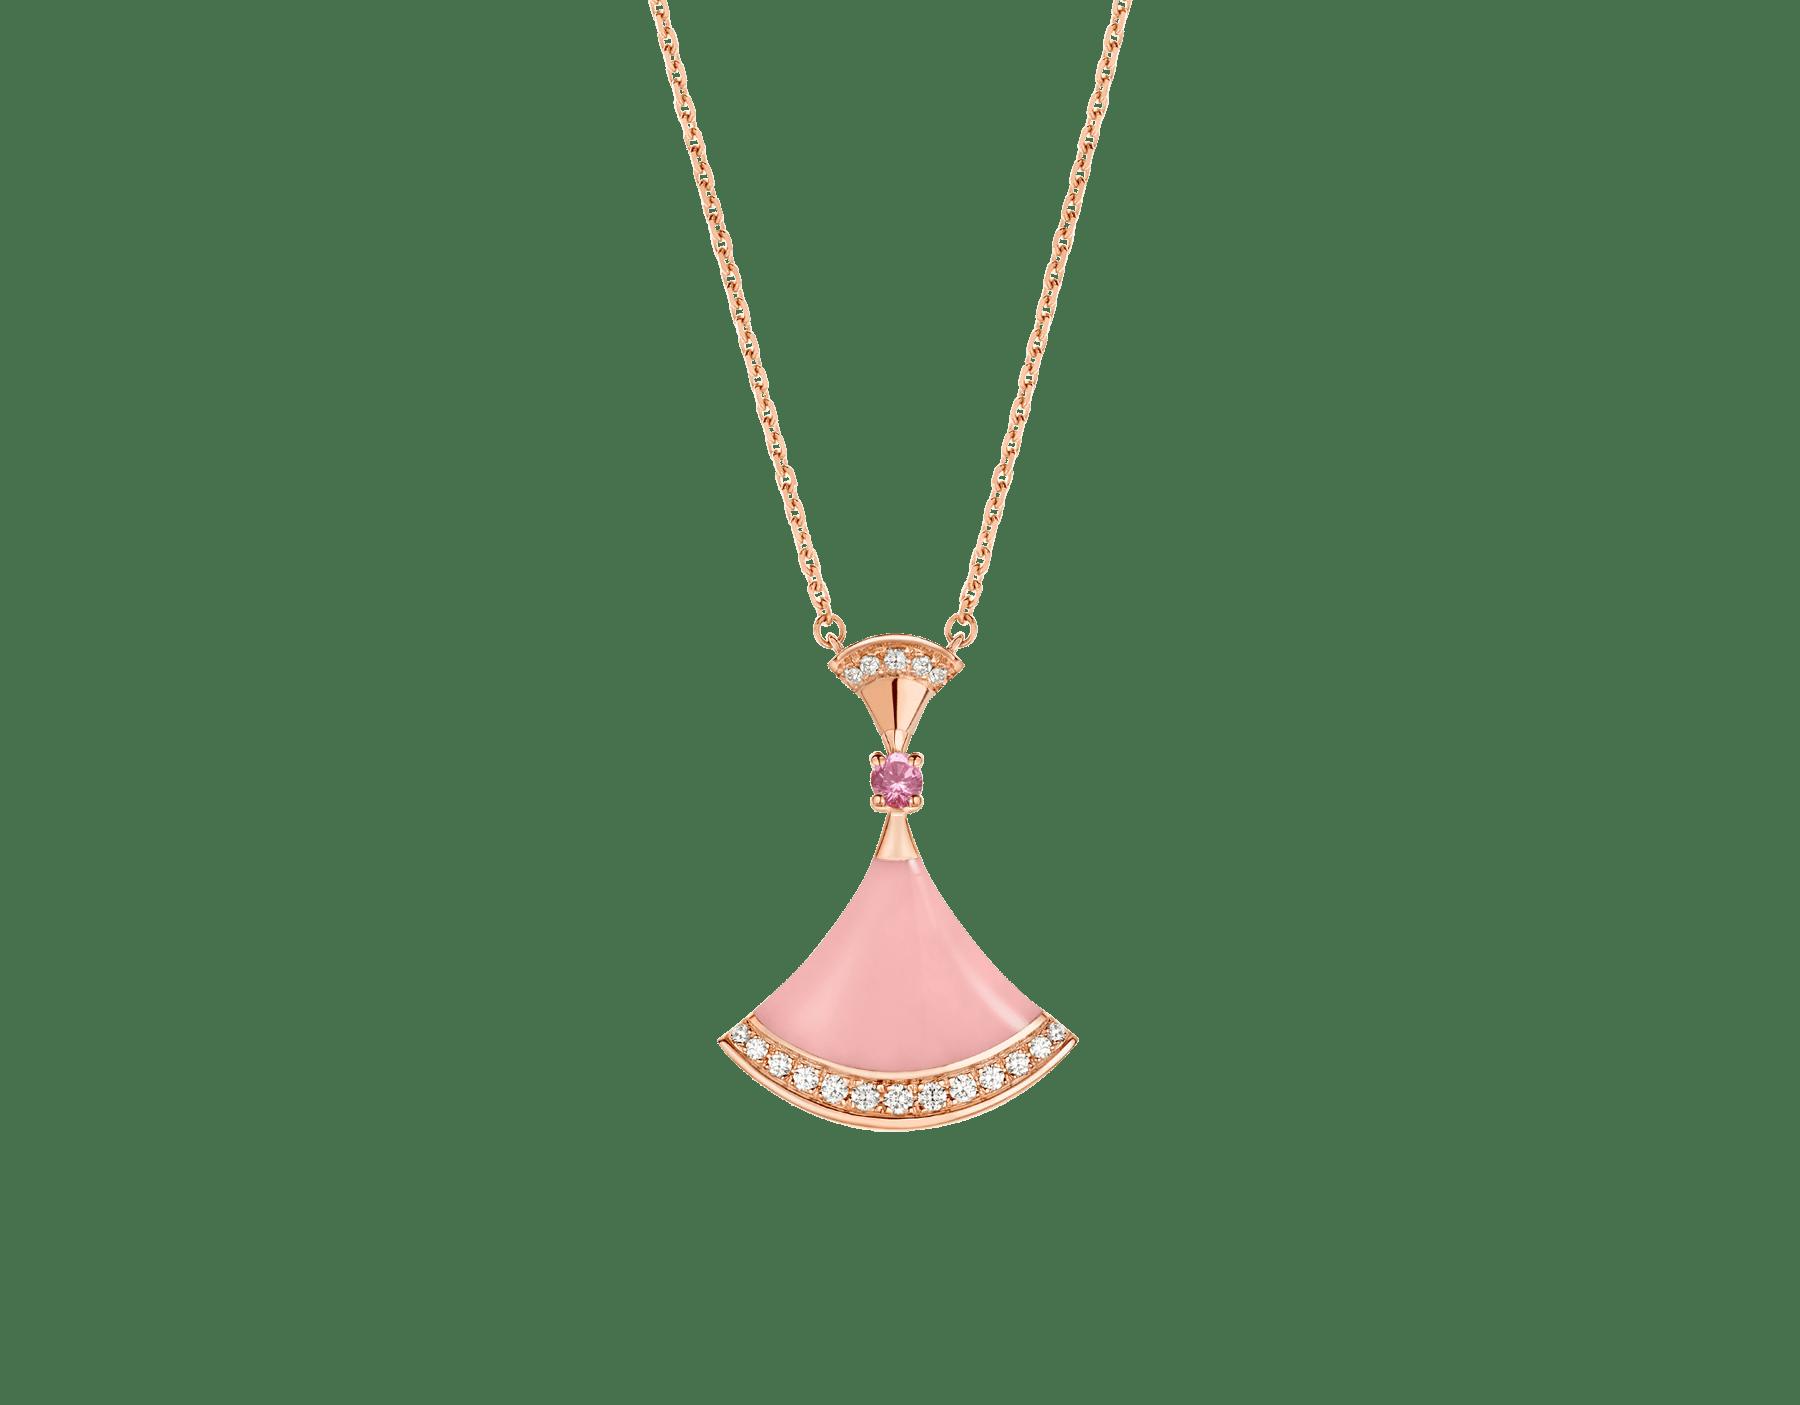 DIVAS' DREAM 18K 玫瑰金項鍊,項墜鑲飾粉紅色蛋白石和 1 顆粉紅色藍寶石,並綴以密鑲鑽石。七夕情人節特別版項鍊。 358131 image 1